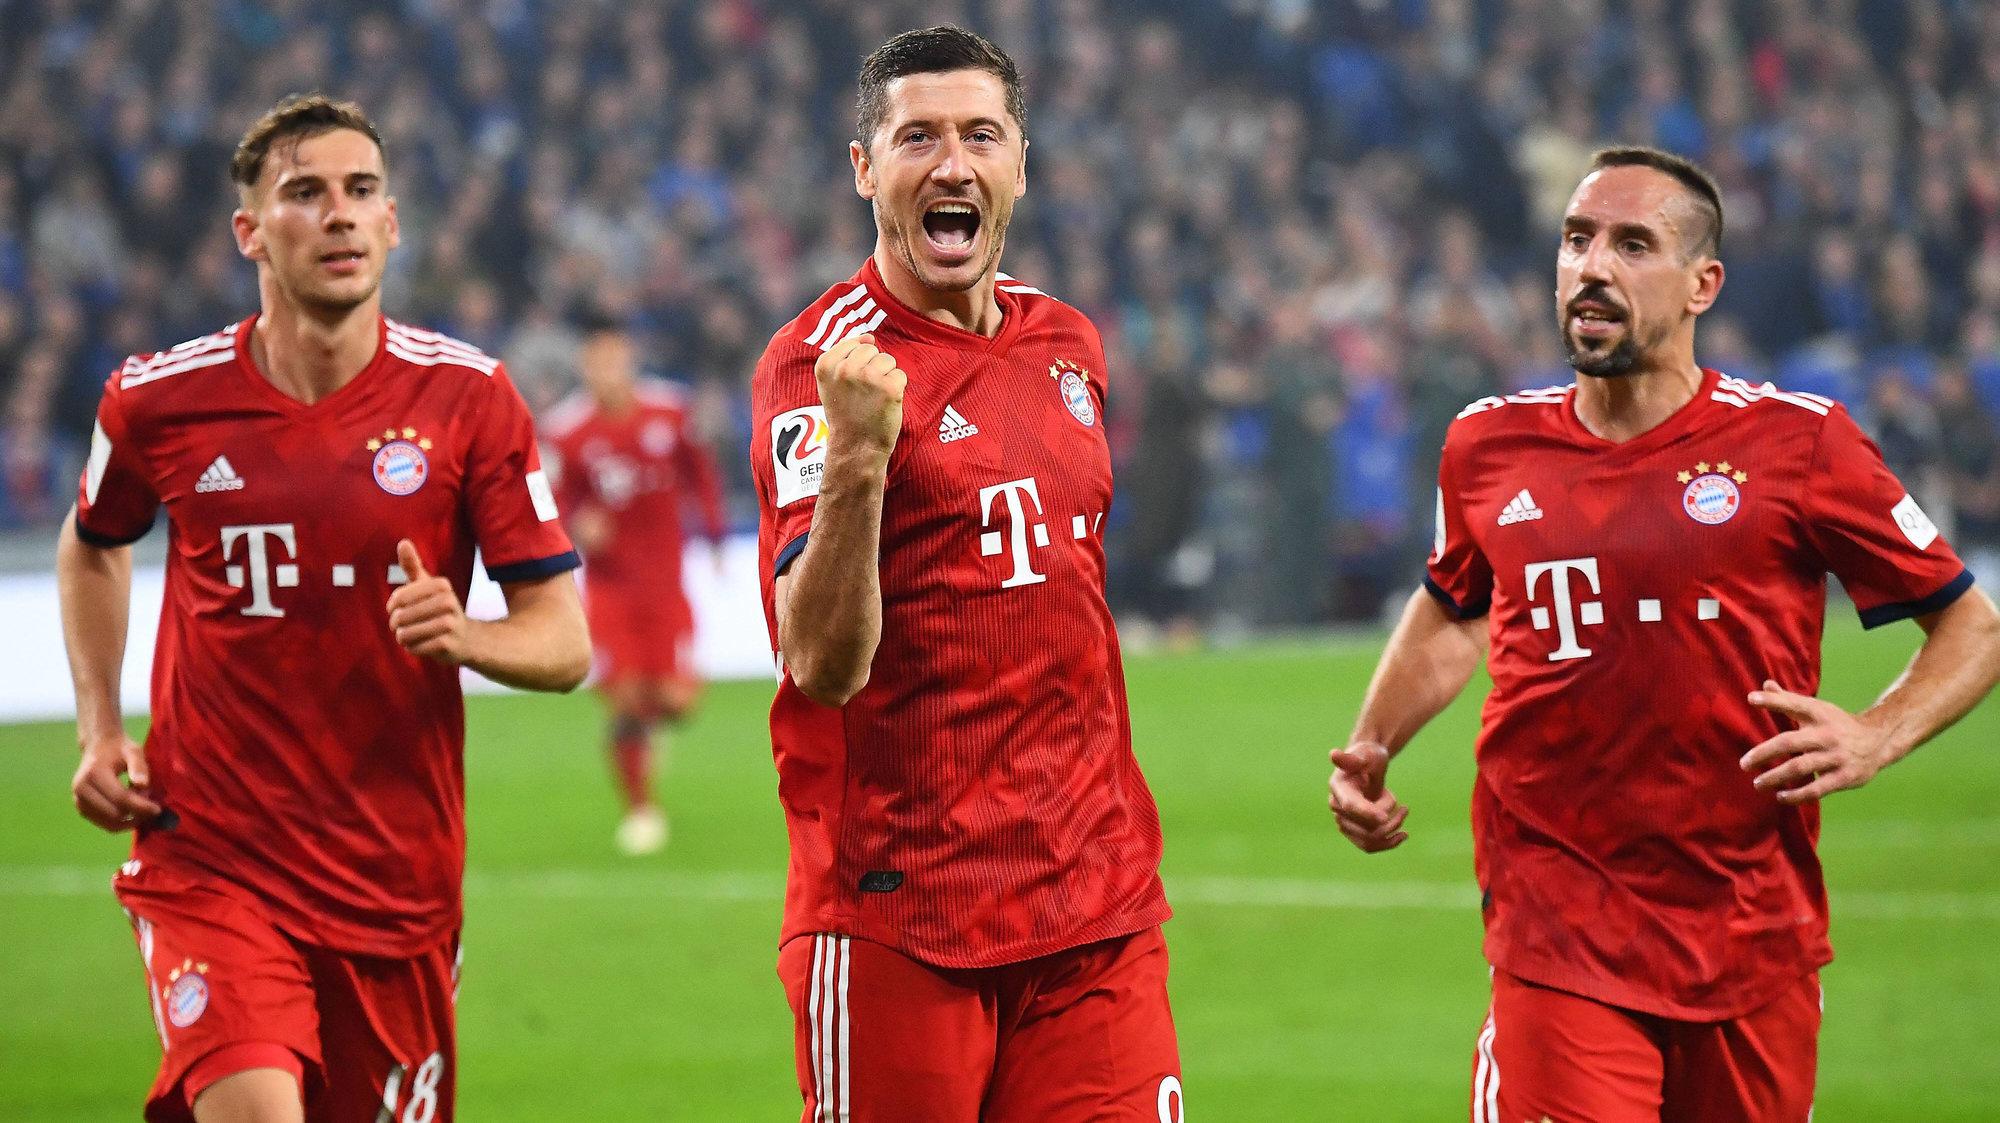 Бавария боруссия кубок финал 2016 прямая трансляция